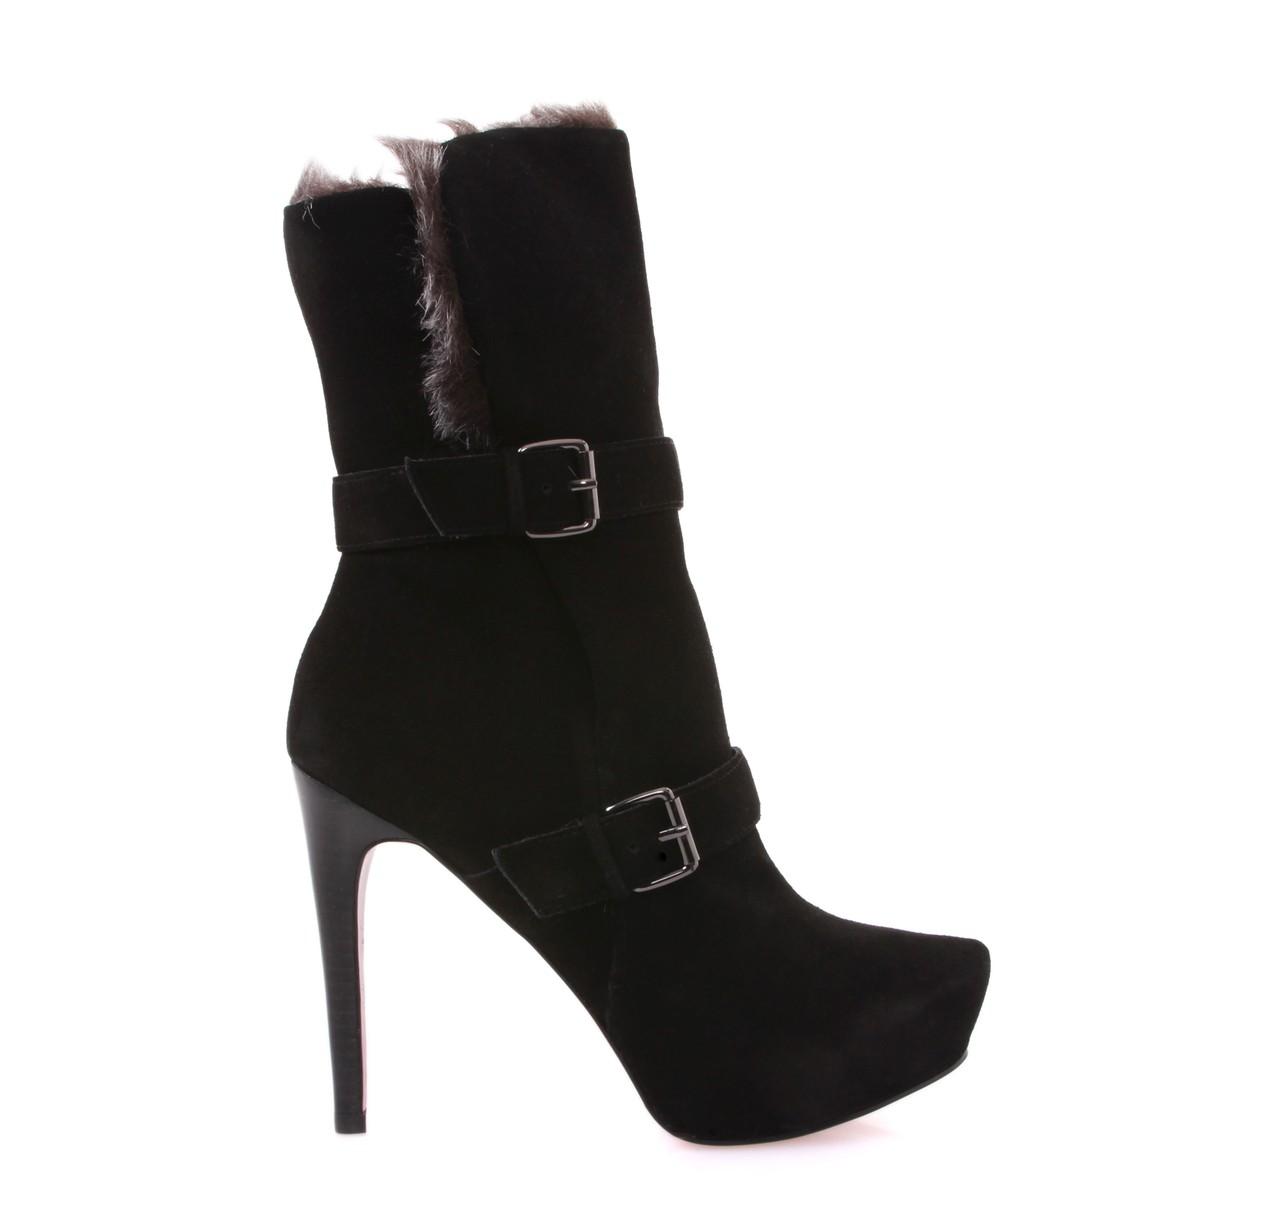 cd780c28684 Best Offers > Ενήλικες > Παπούτσια > Μπότες & Μποτάκια / ΓΥΝΑΙΚΕΙΑ ΜΠΟΤΑΚΙΑ  ΨΗΛΟΤΑΚΟΥΝΑ PARIS HILTON (BLACK) CANDACE - GoldenShopping.gr